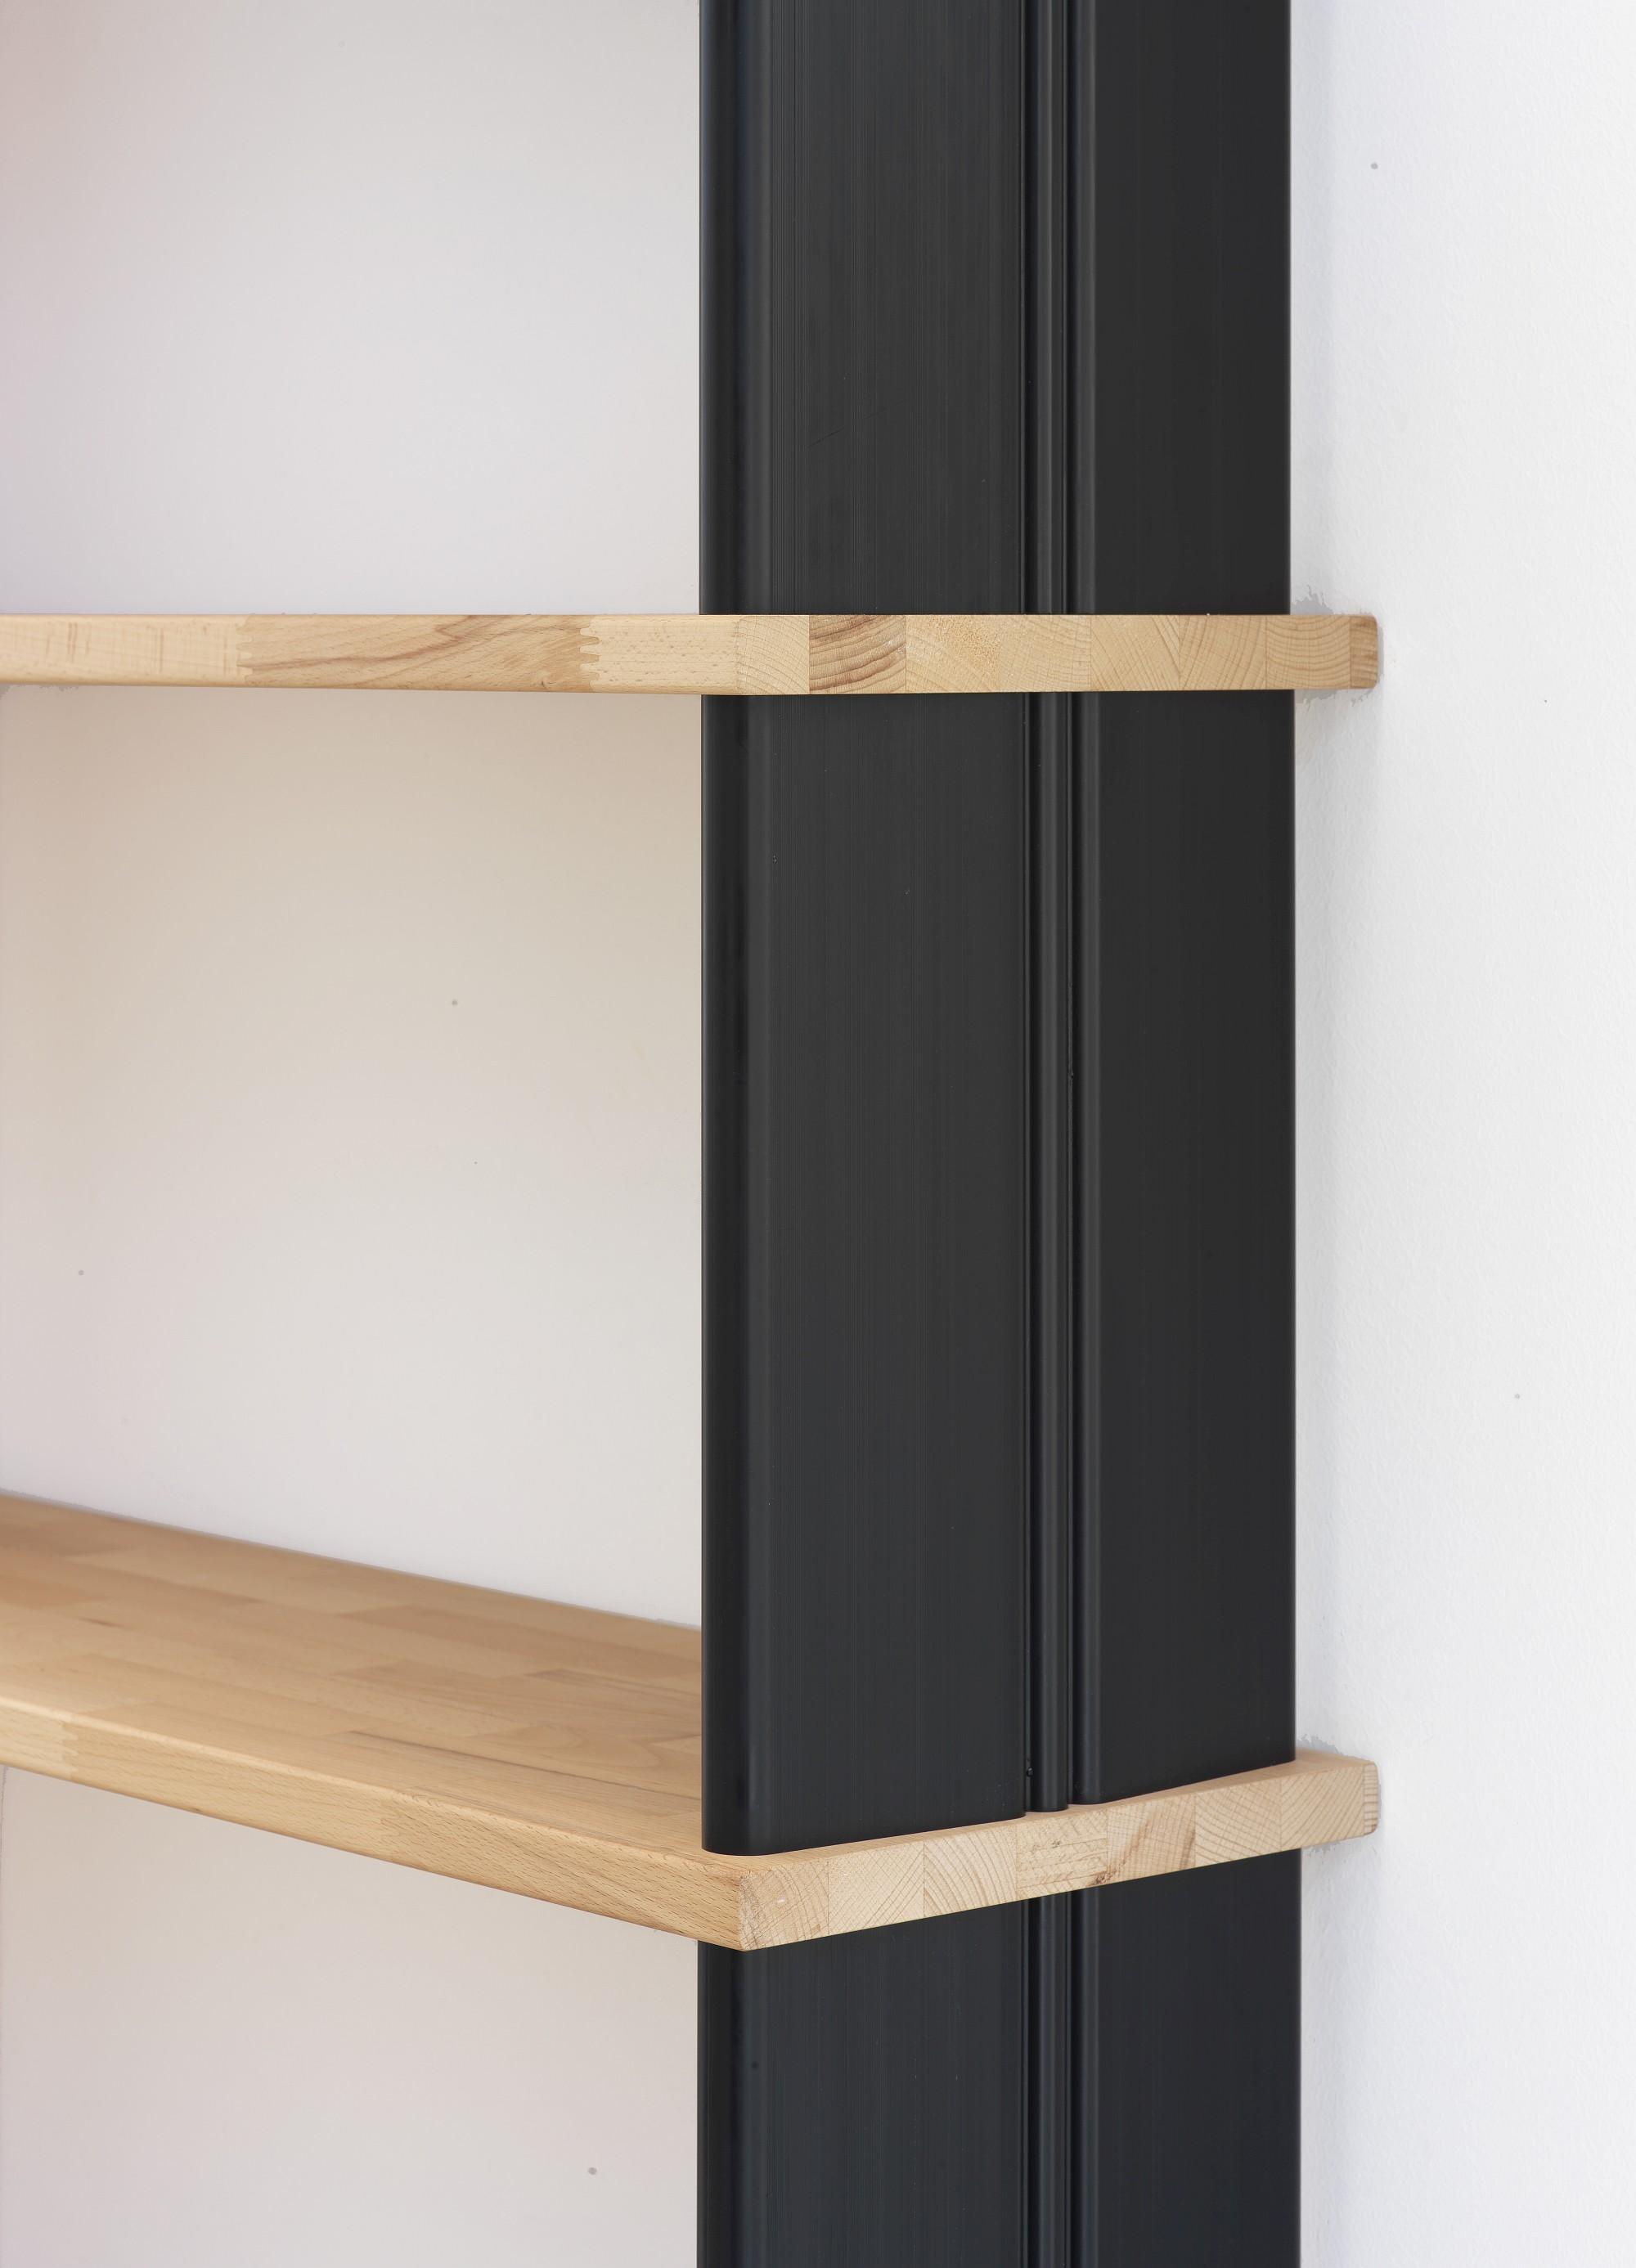 Nikka wood librerie componibili a parete in legno massello for Librerie in legno componibili